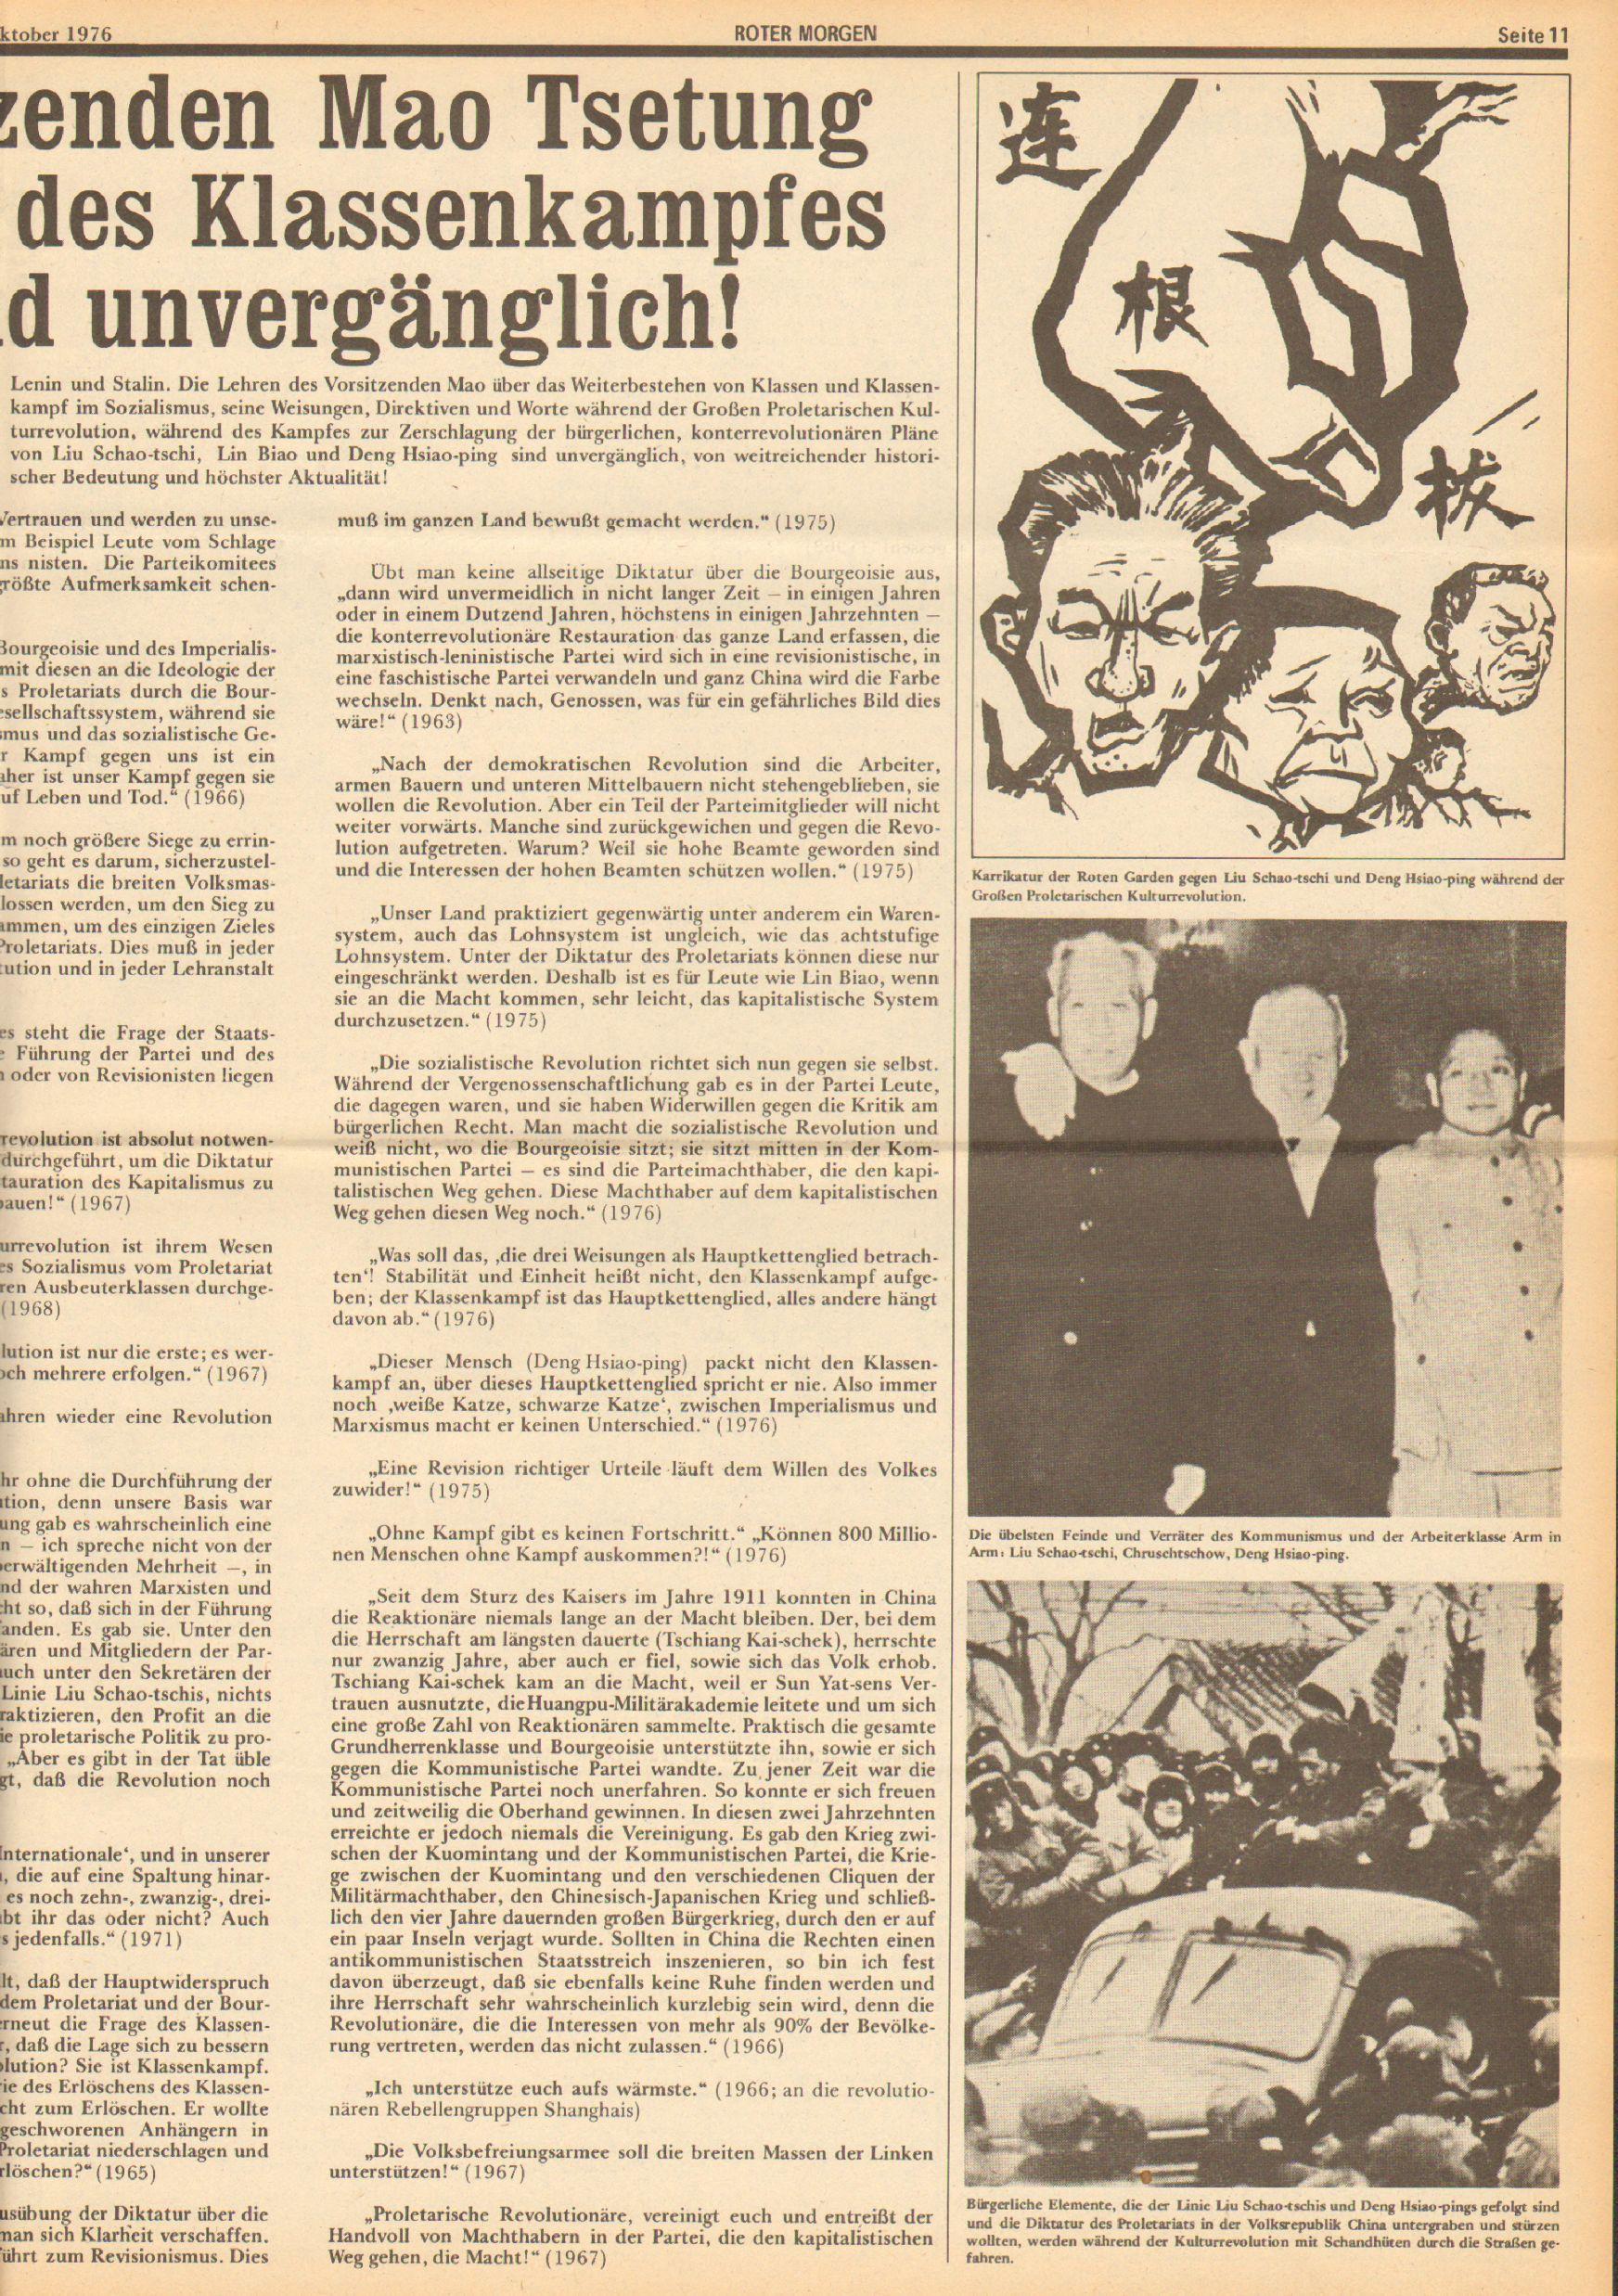 Roter Morgen, 10. Jg., 23. Oktober 1976, Nr. 43, Seite 11